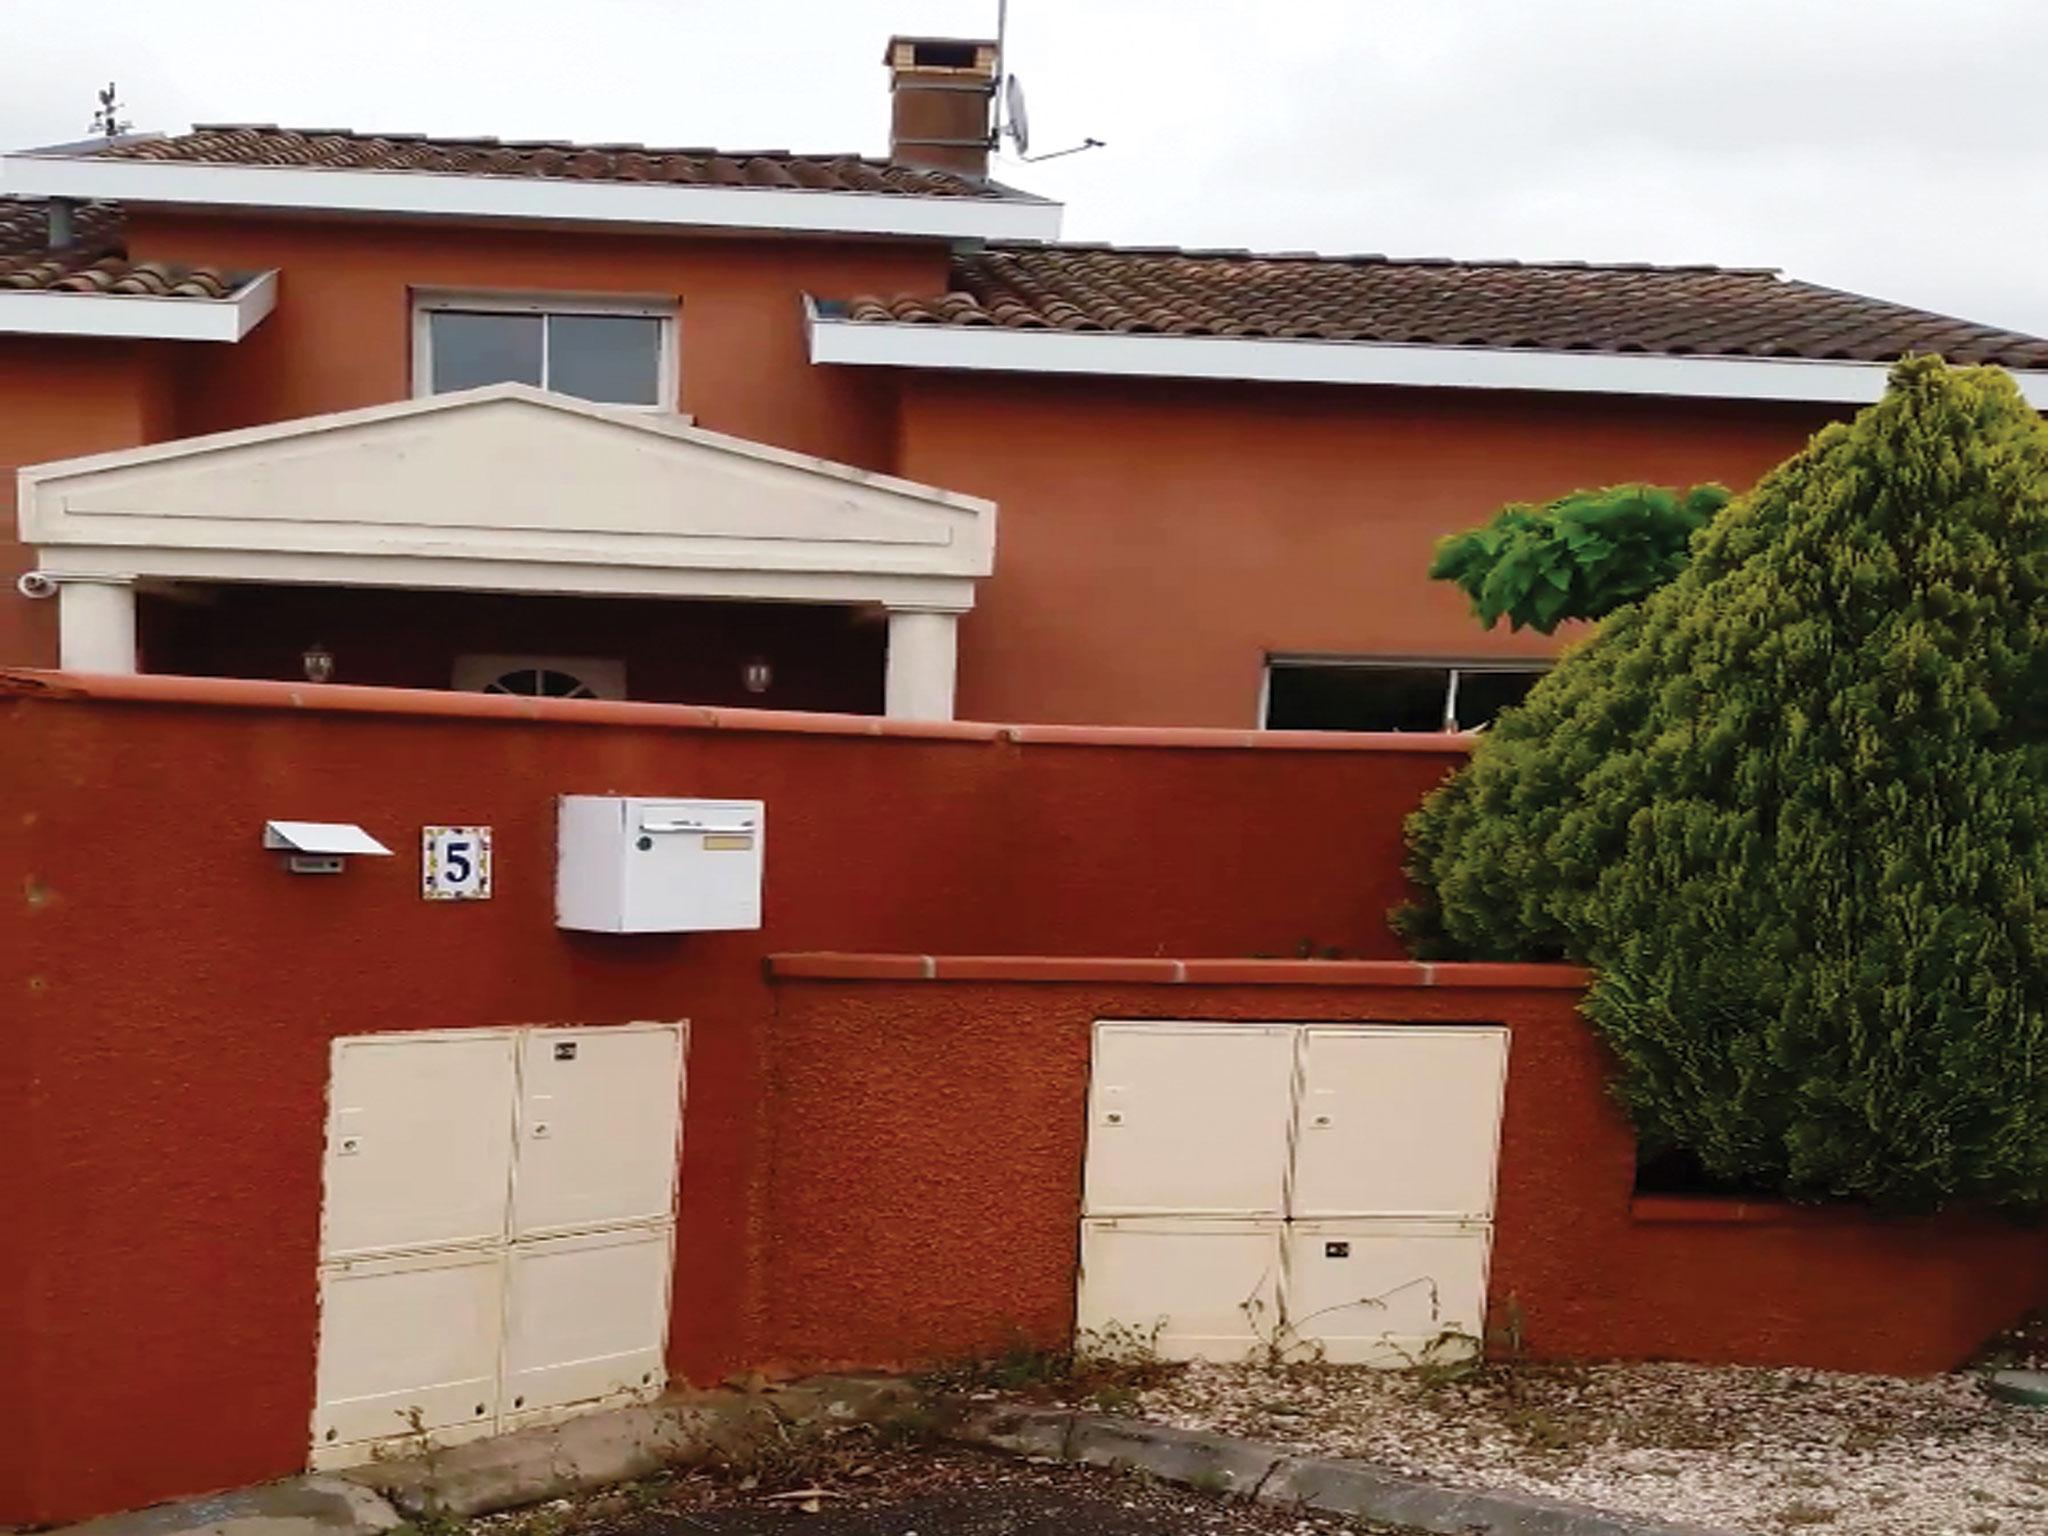 Nettoyage-murs-clôture-terrasse-toit